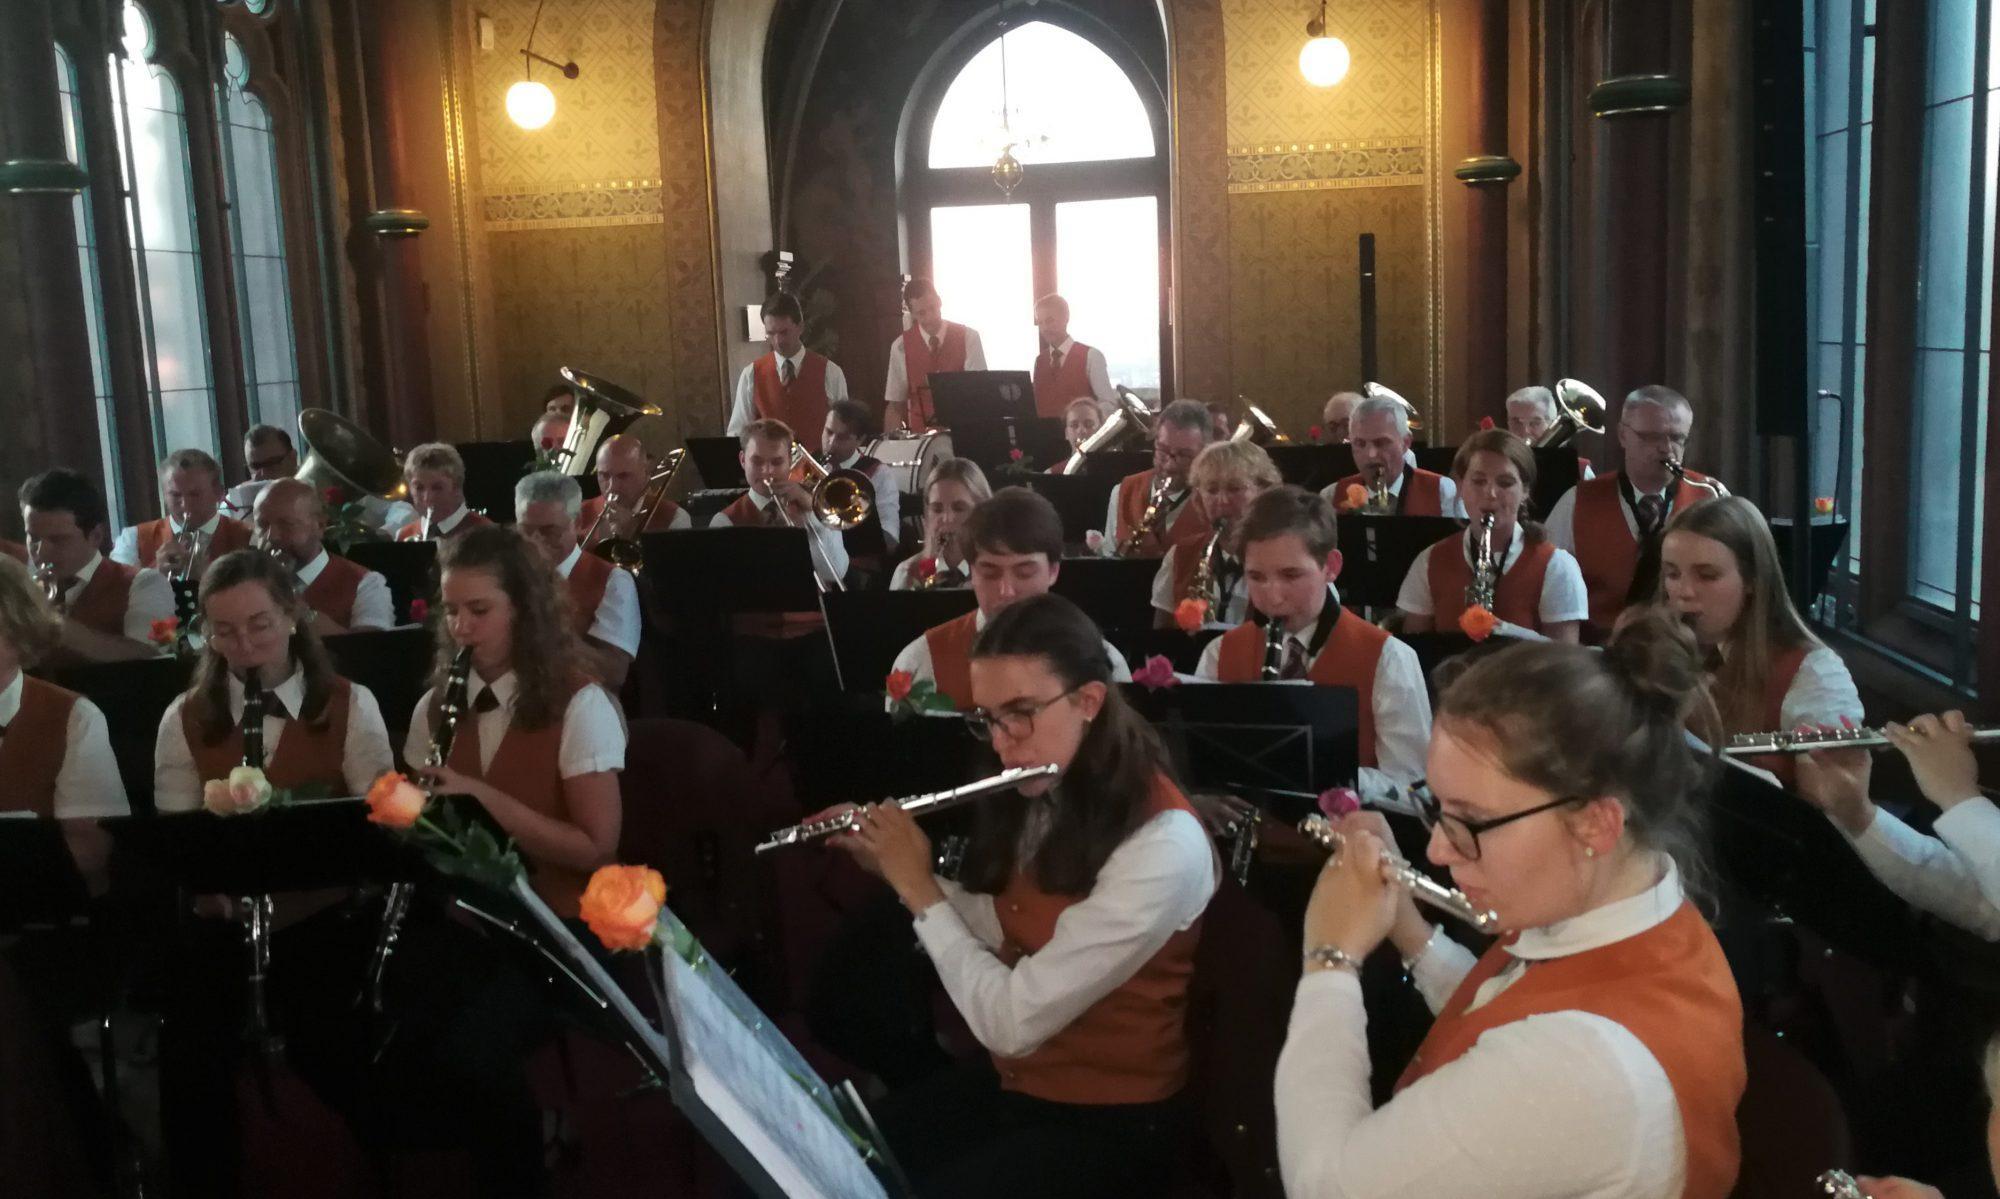 Musikzug Bergklänge e.V.